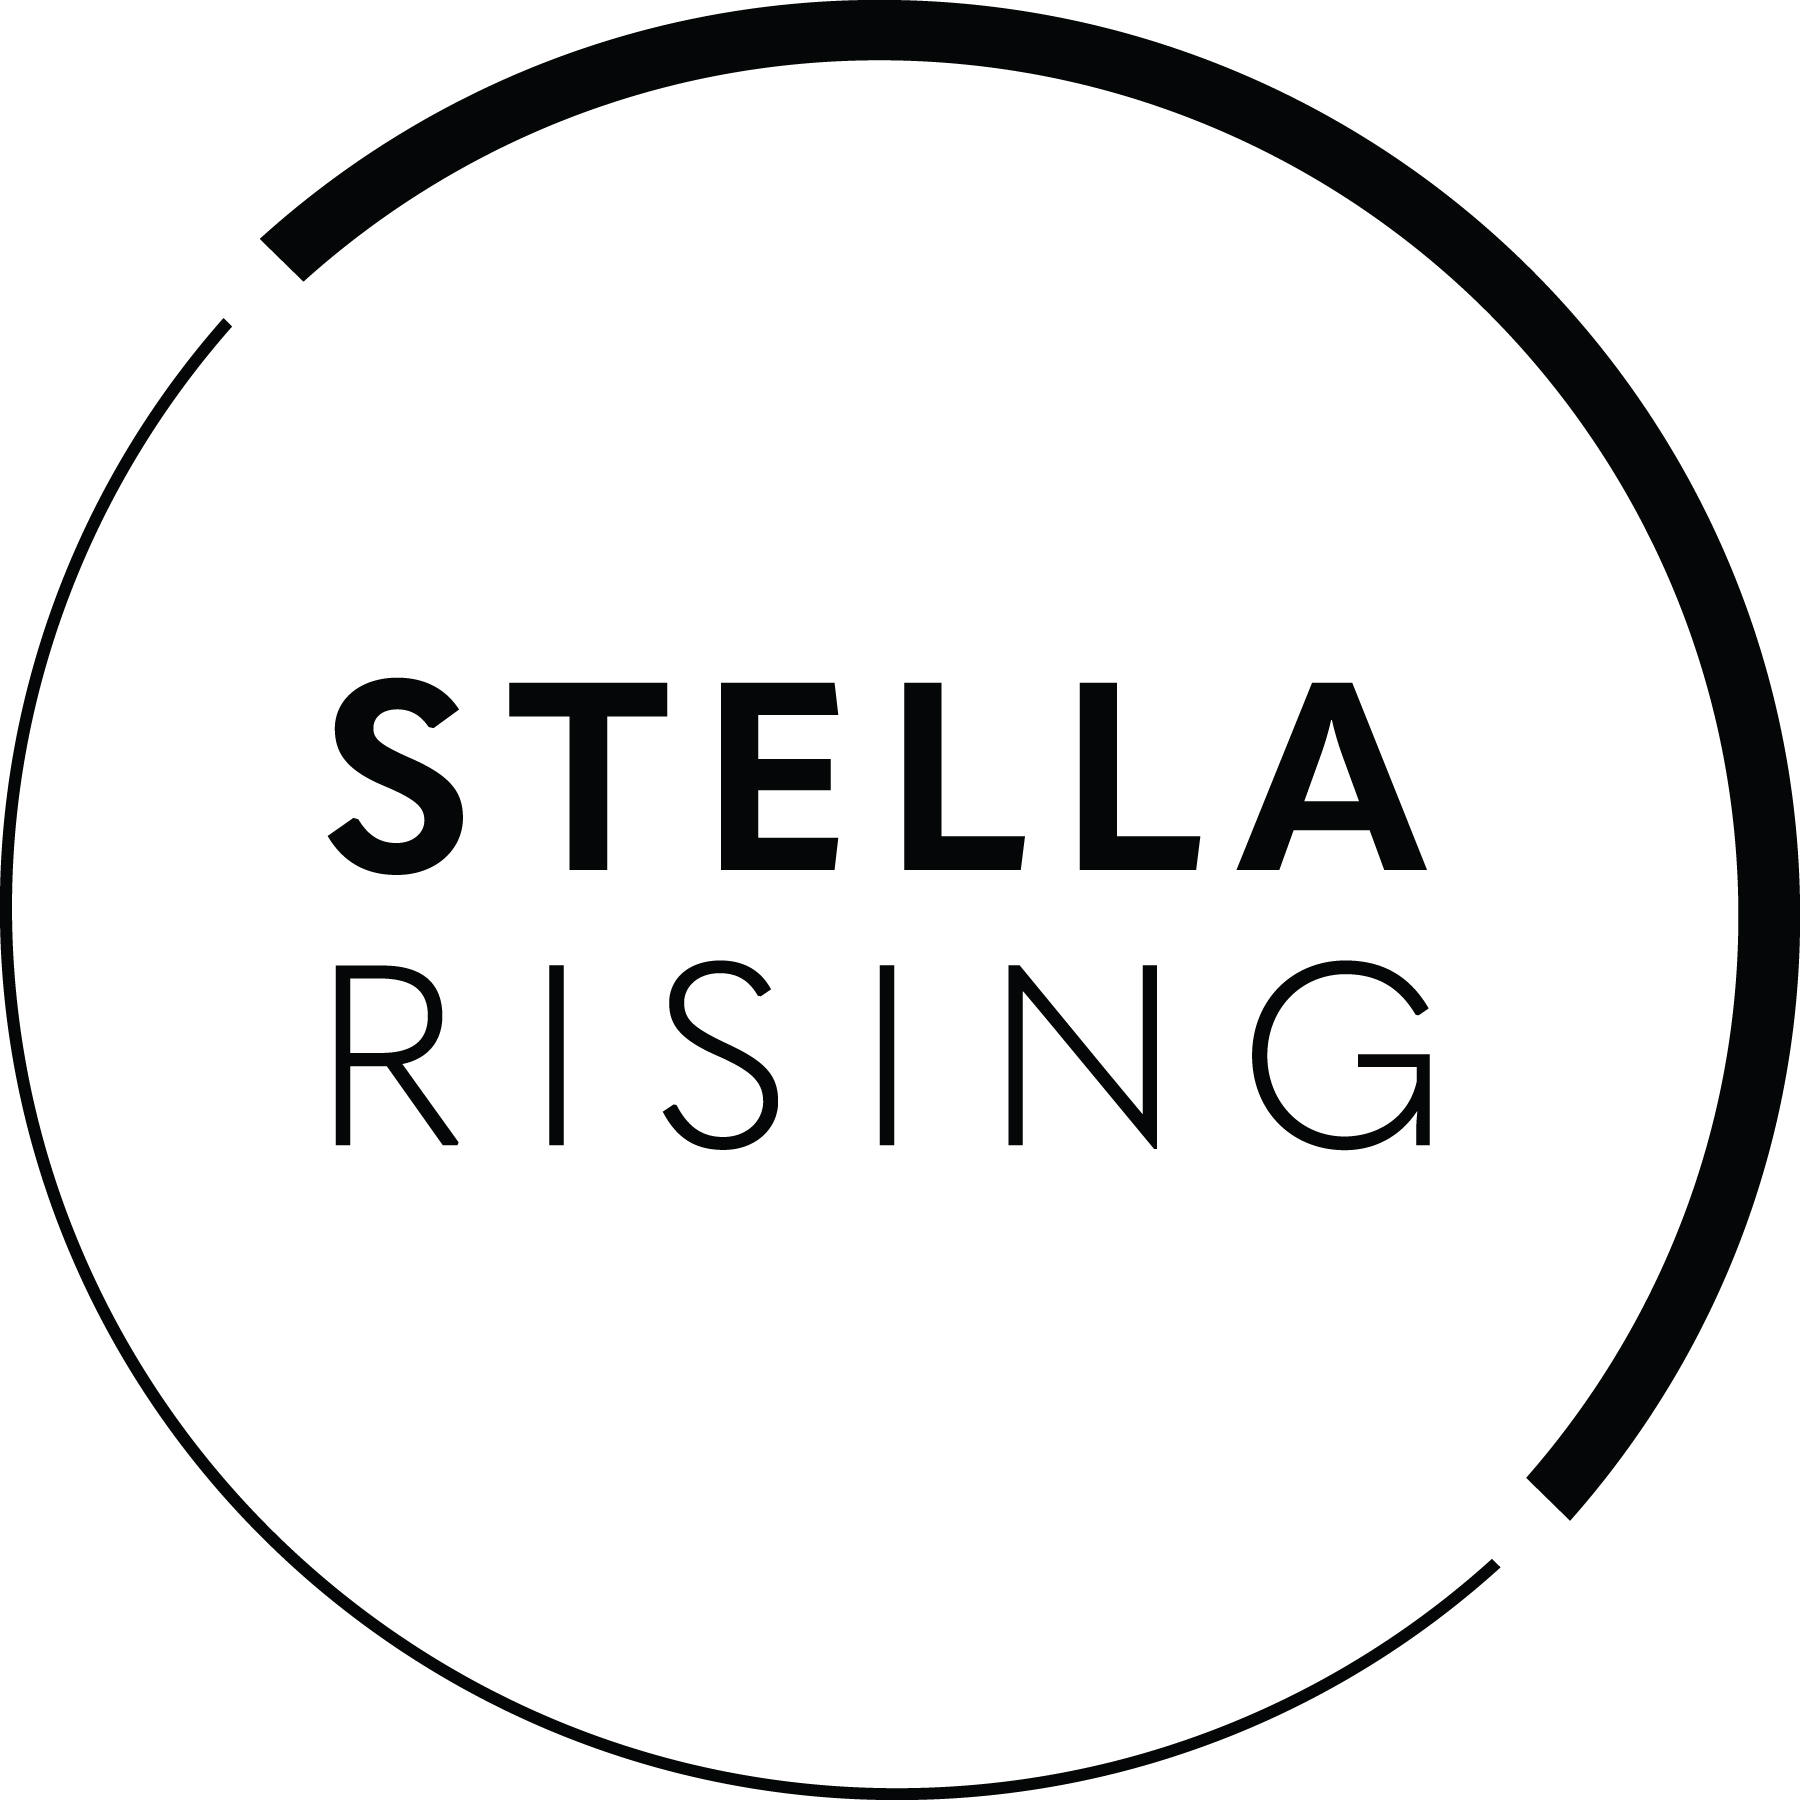 Stella Rising